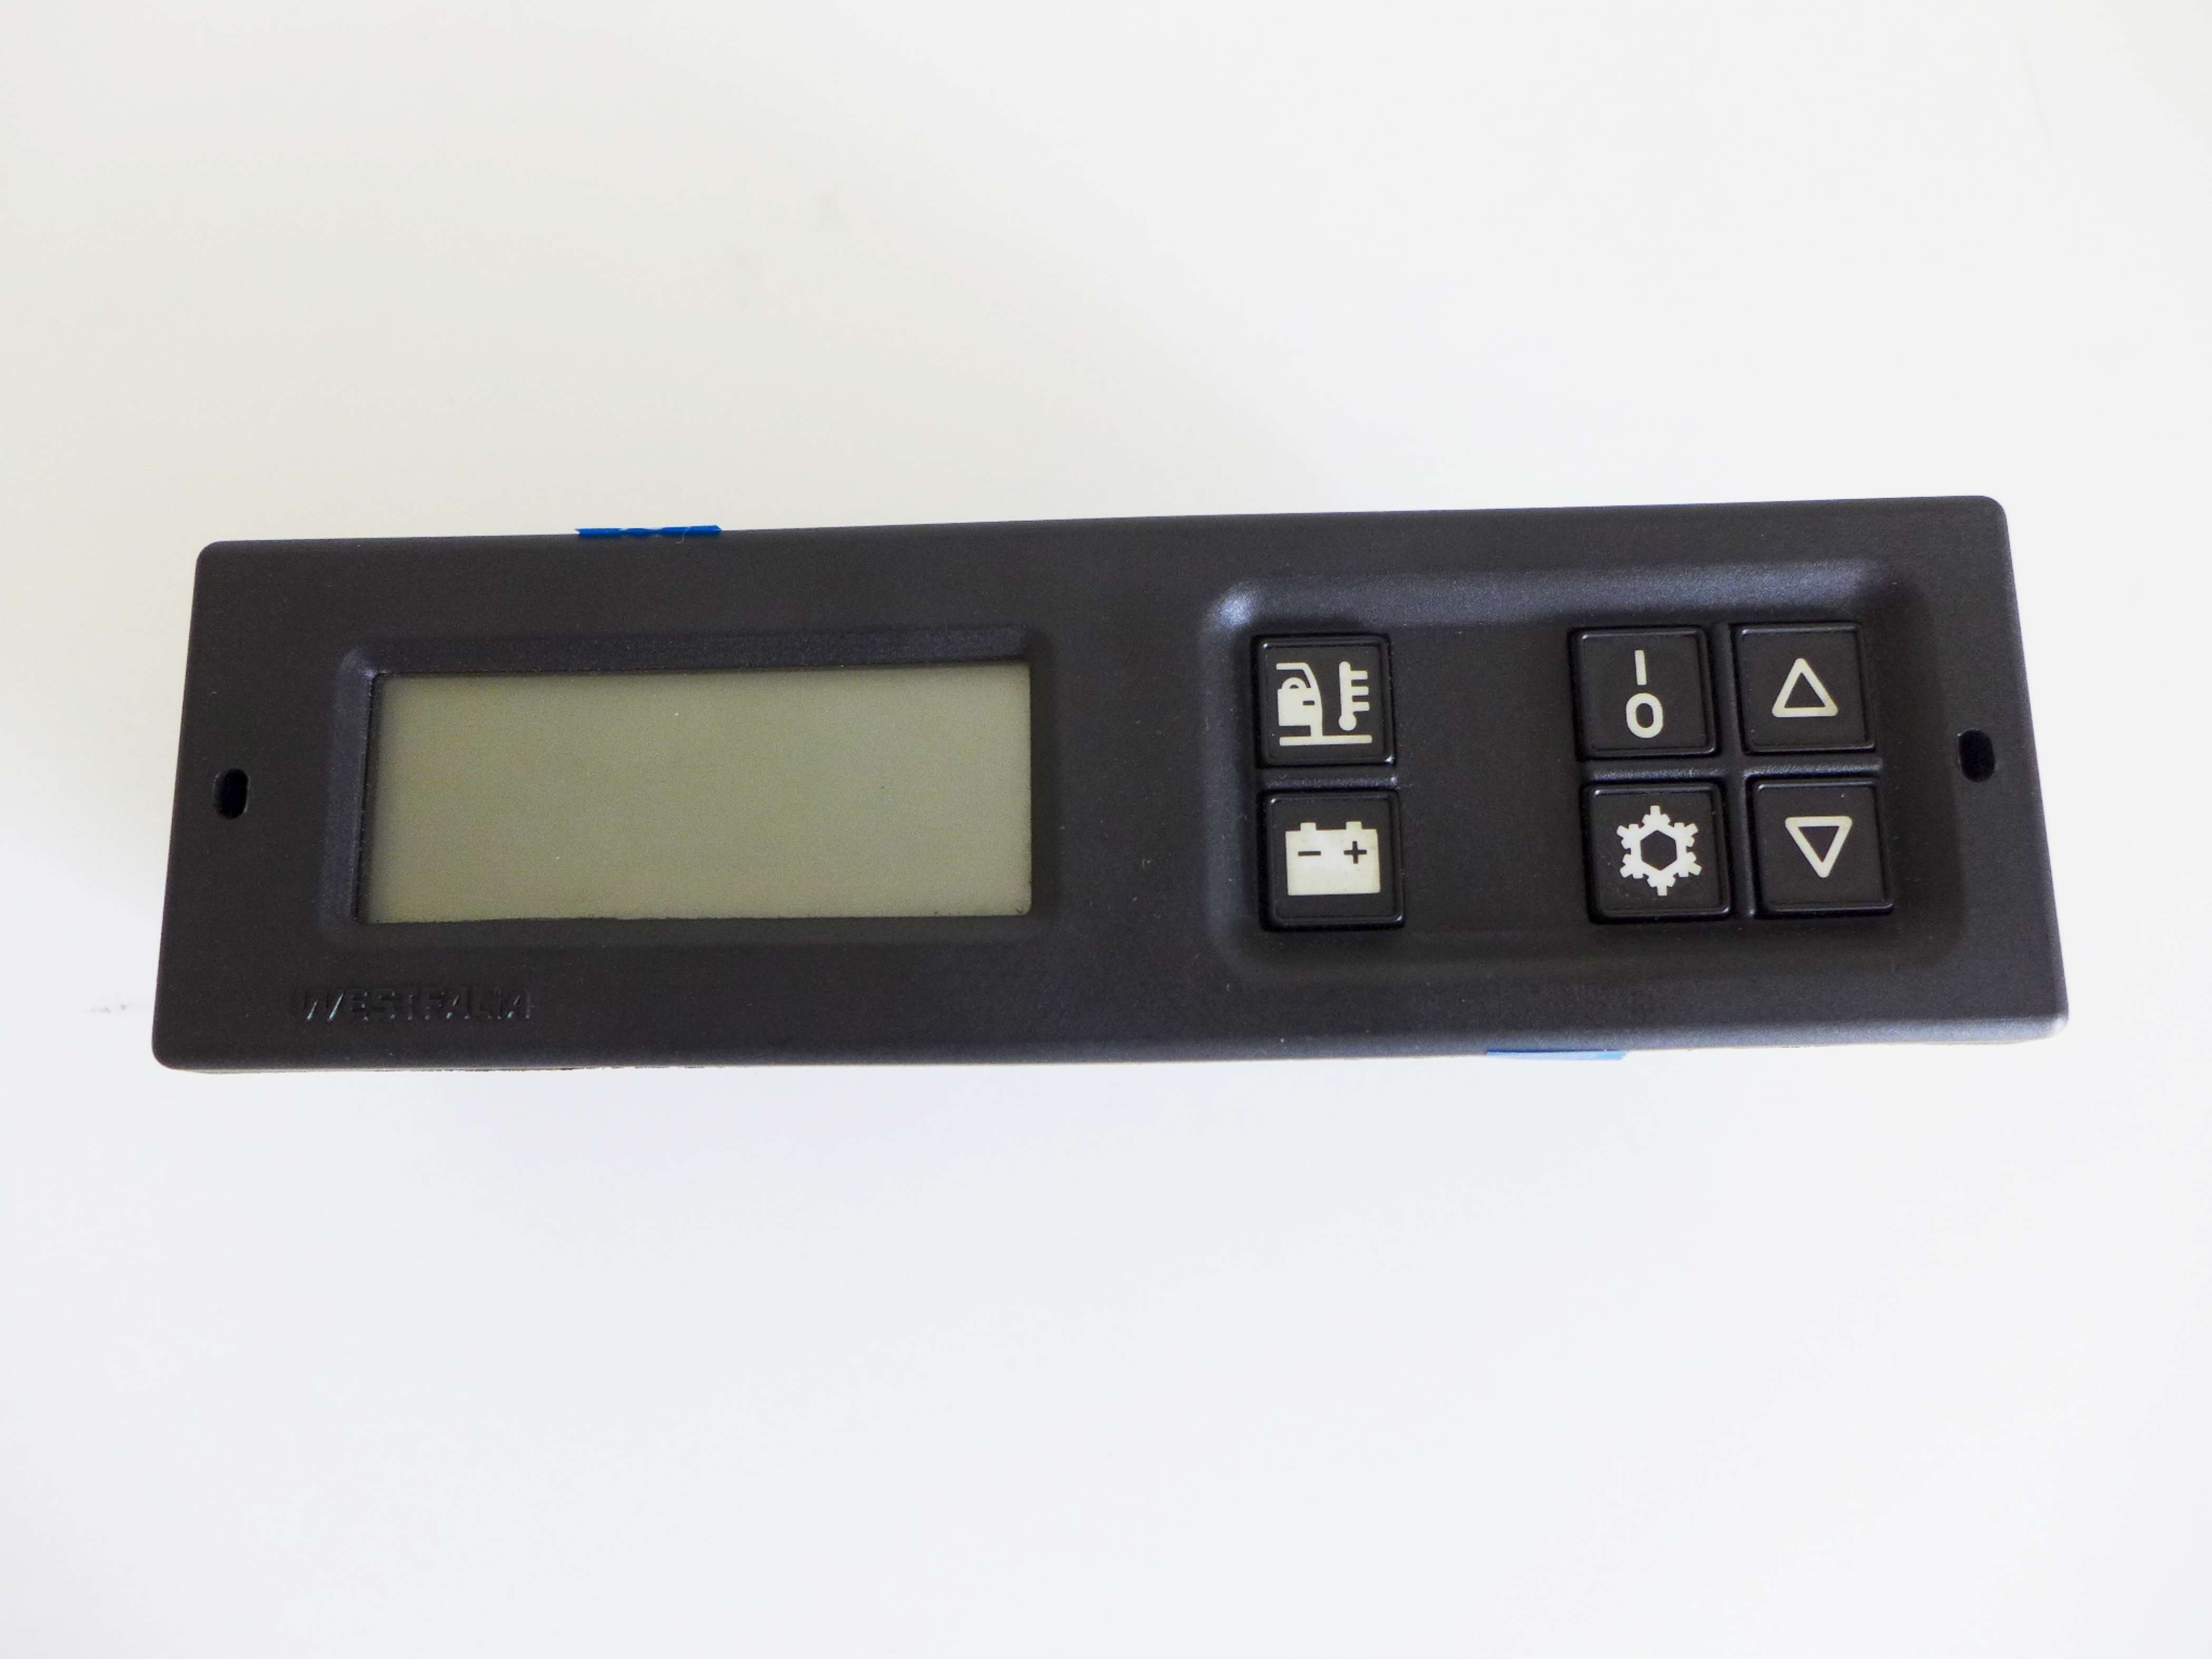 Kühlschrank Vw : Bedienteil vw t california kühlschrank batterie temperatur